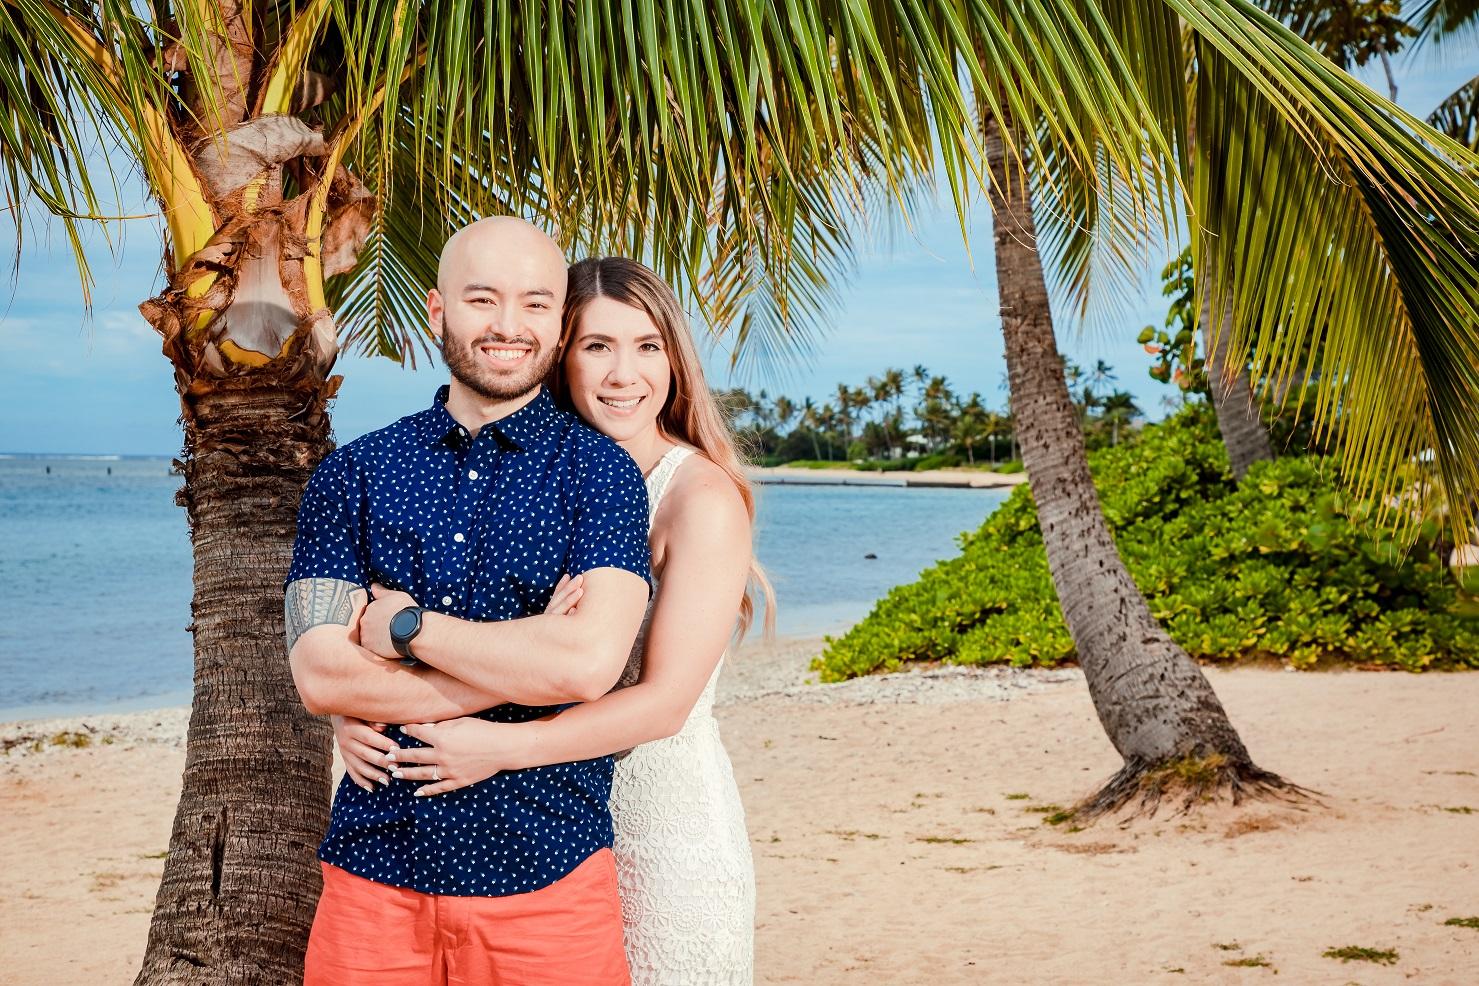 hawaii engaged couples photo session oahu beach